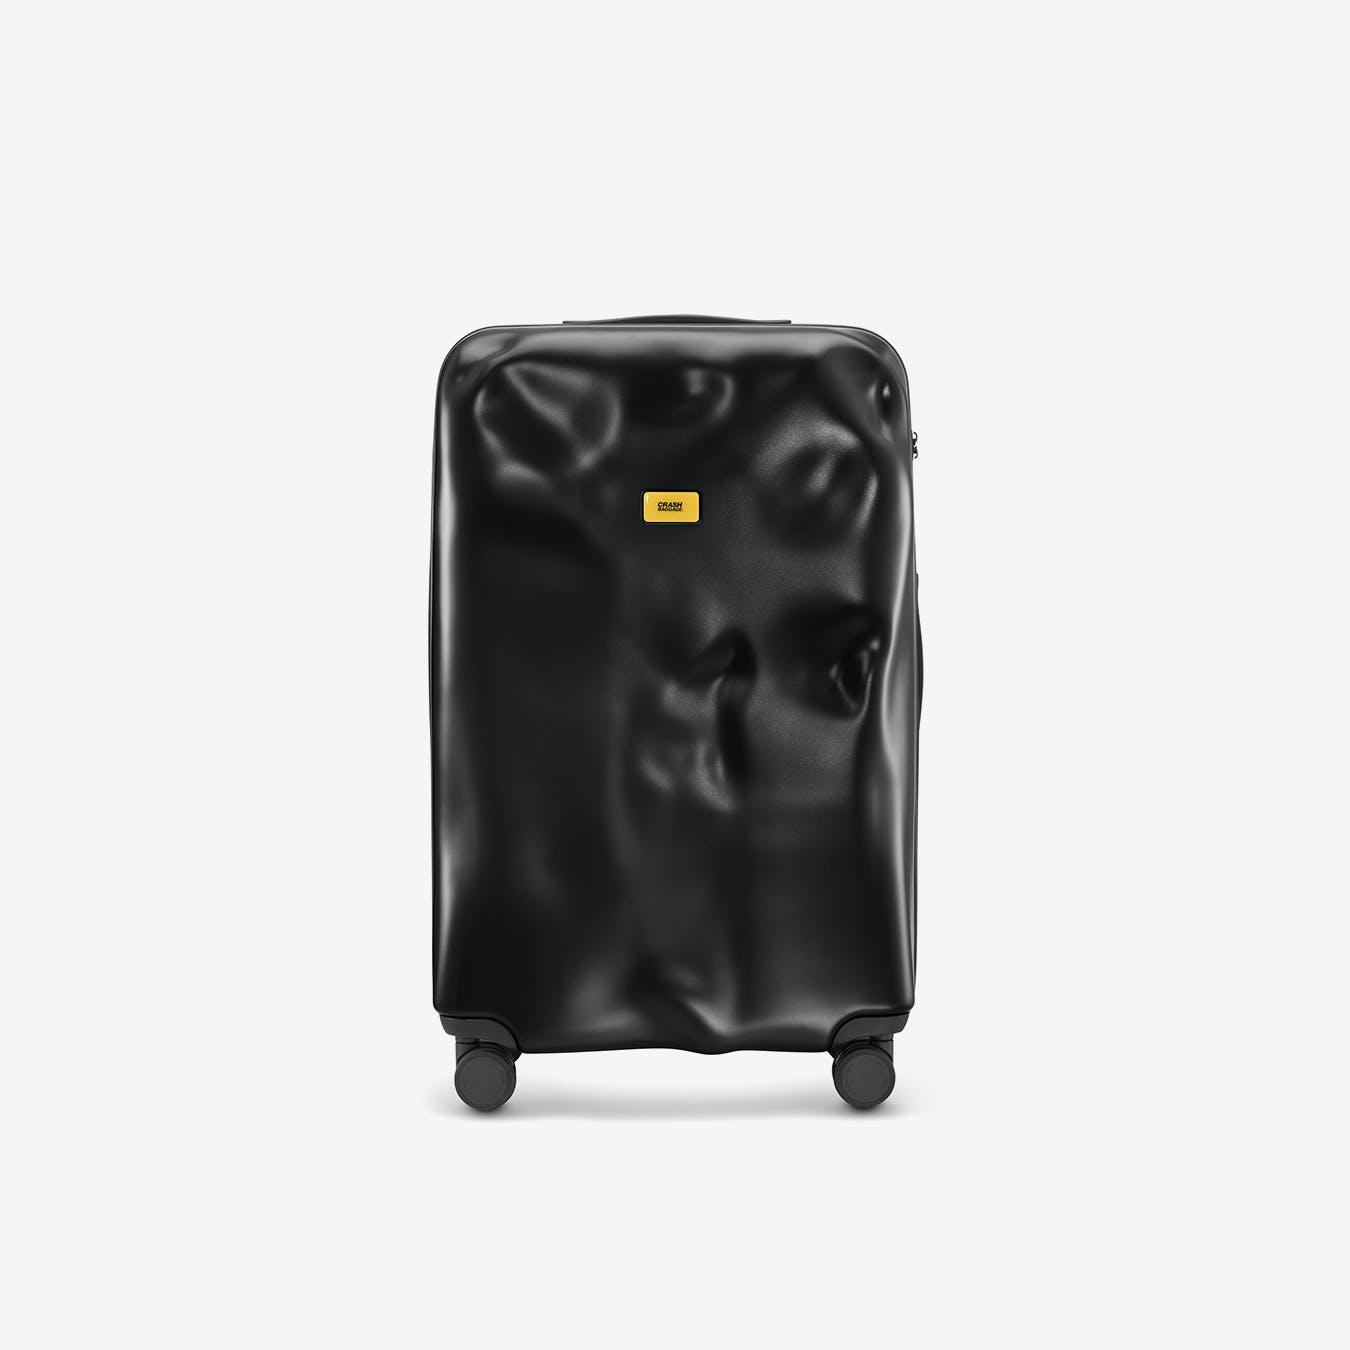 ICON 100L Luggage in Black